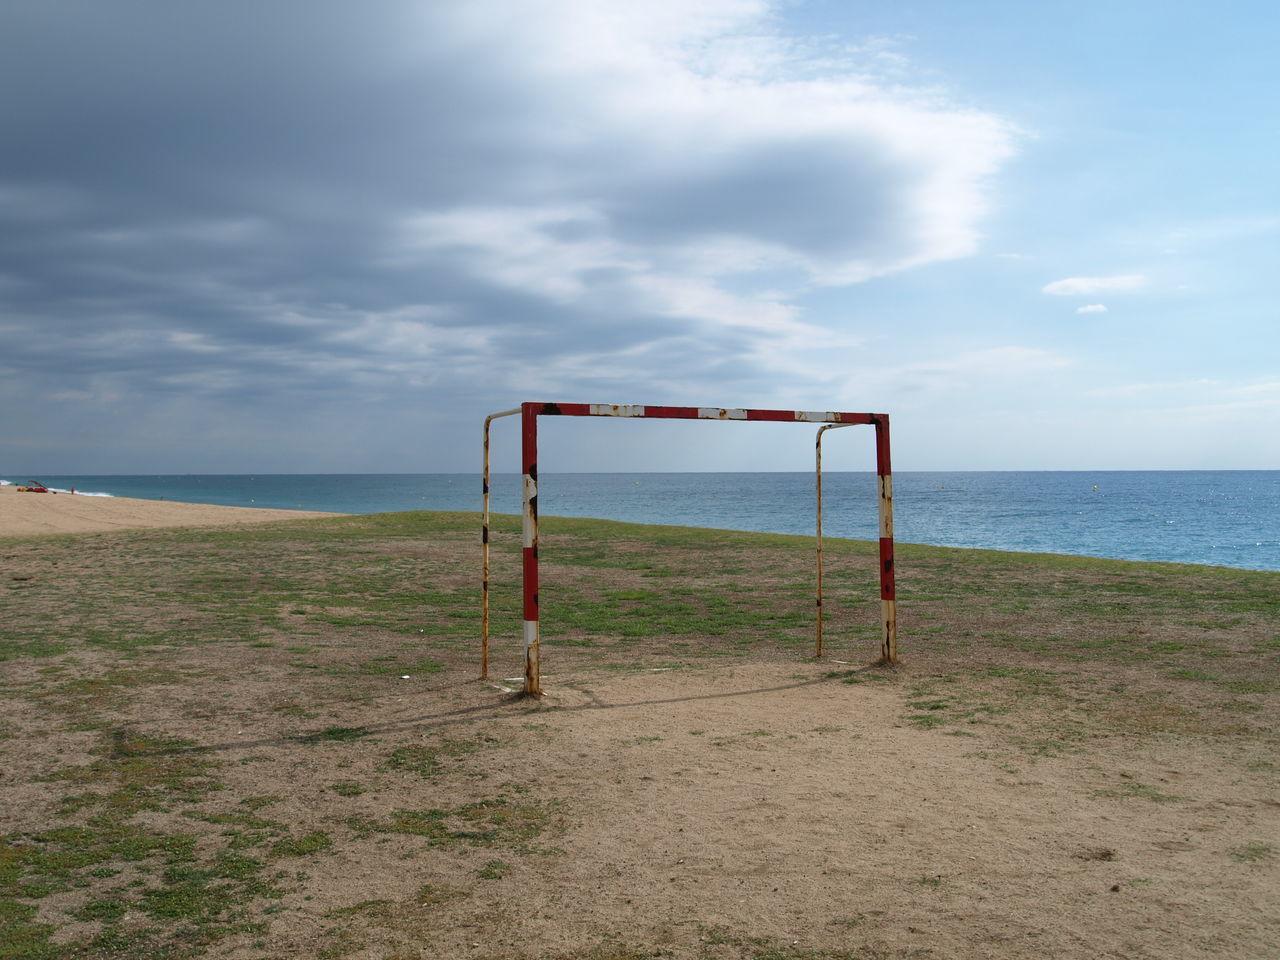 Beach Day Goal Horizon Over Water Nature Outdoors Sand Sea Sky Water